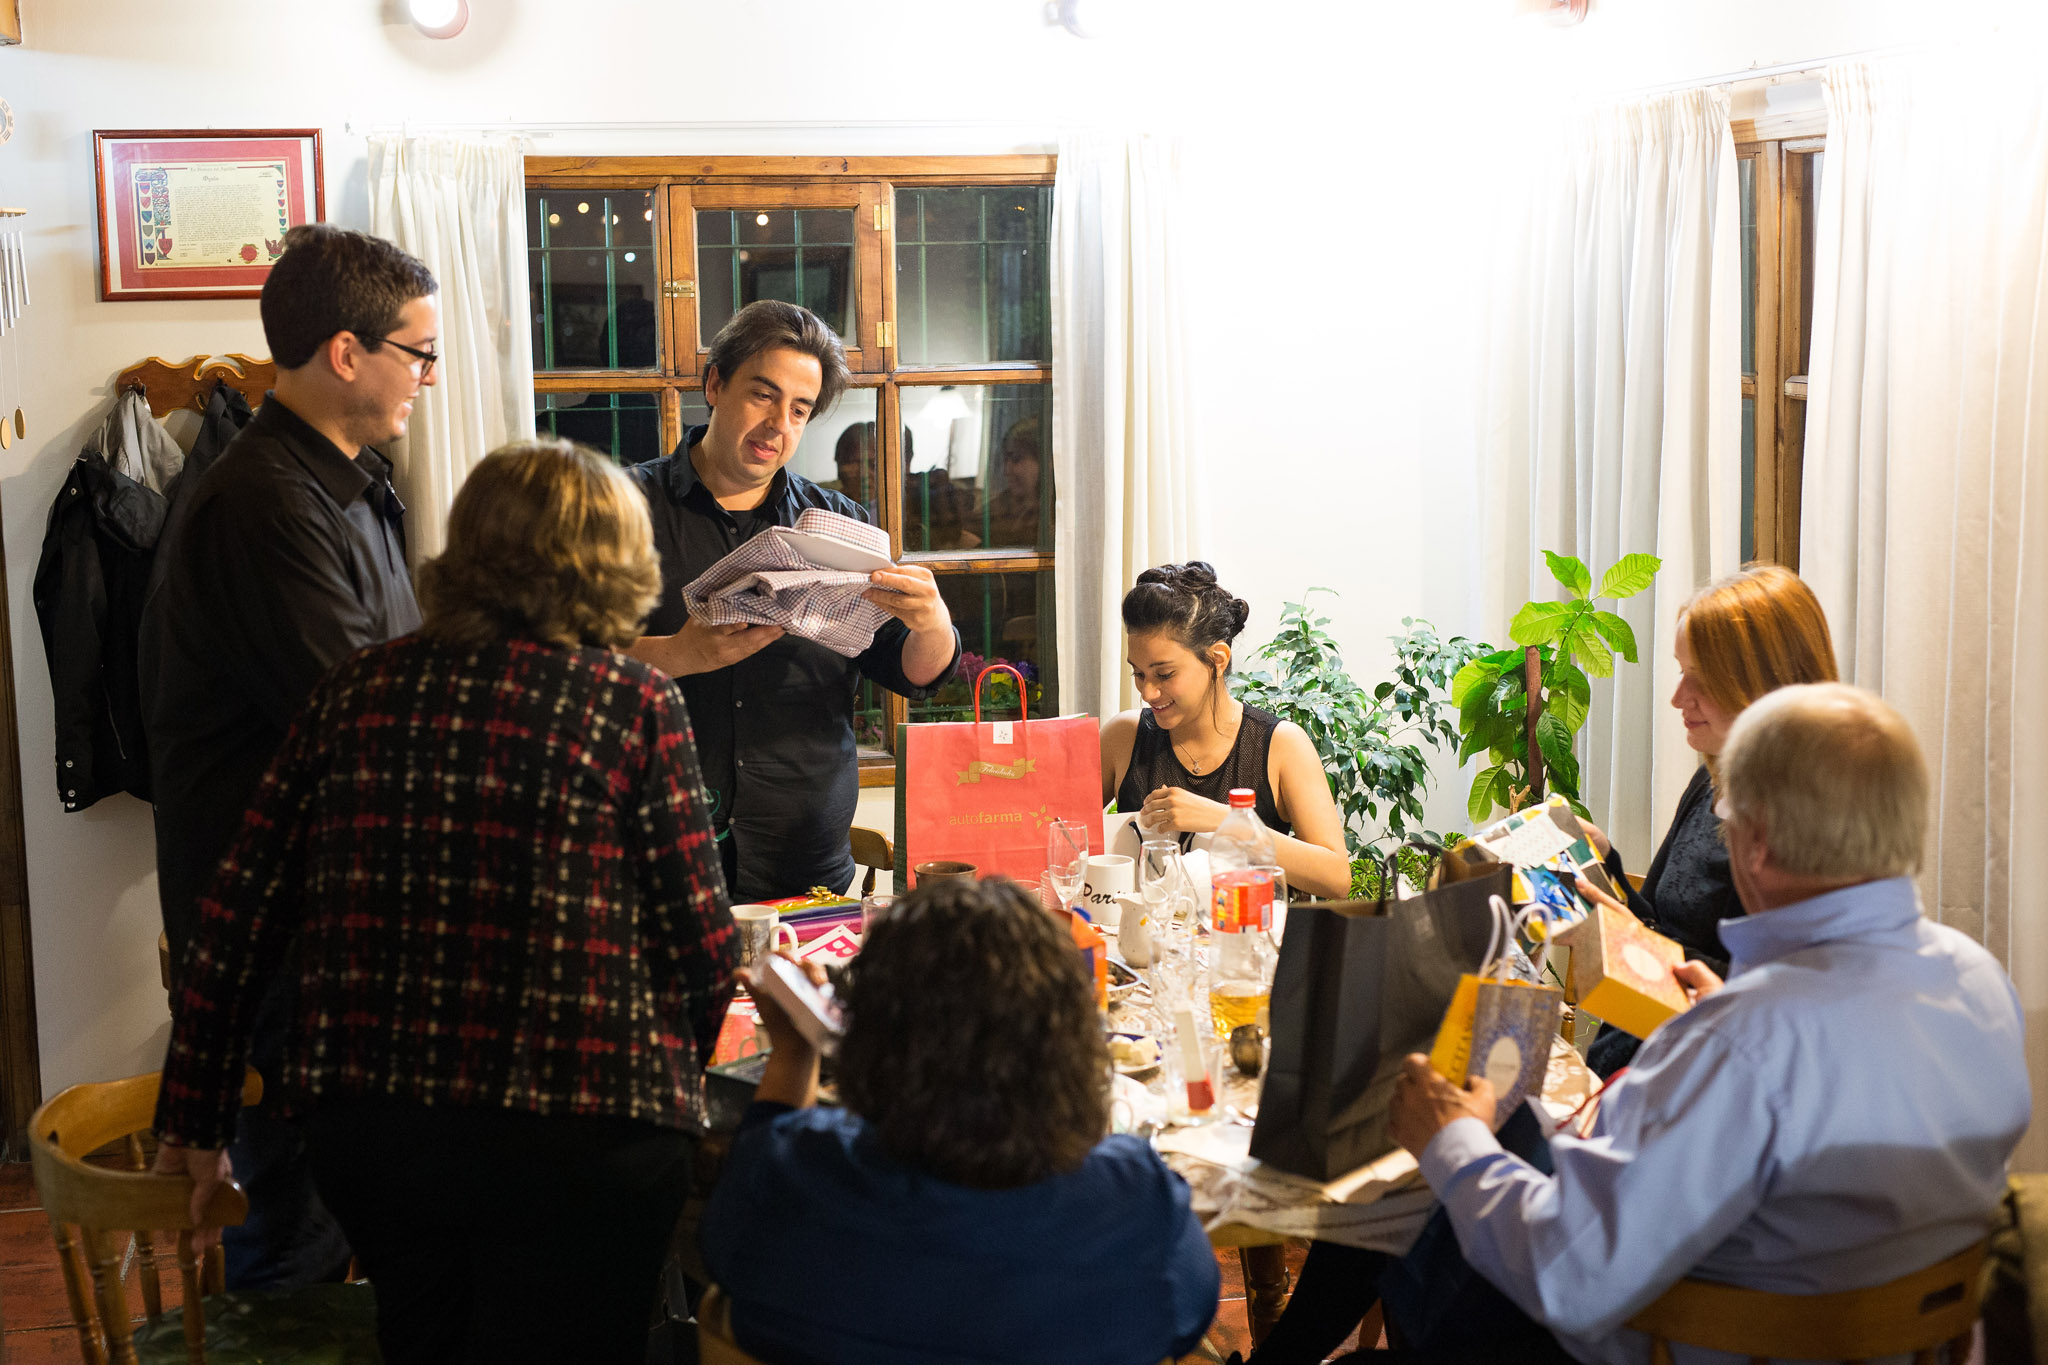 wedding-travellers-destination-wedding-argentina-fin-del-mundo-end-world-ushuaia-christmas-friends-family